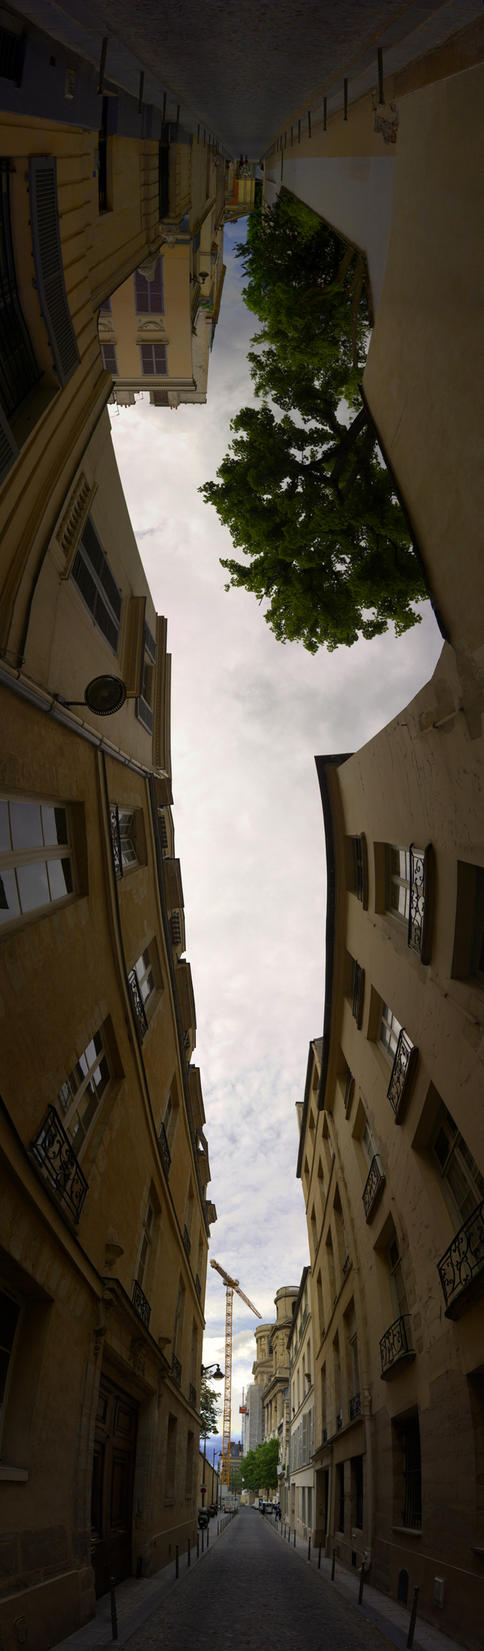 Upside down by cjvernet